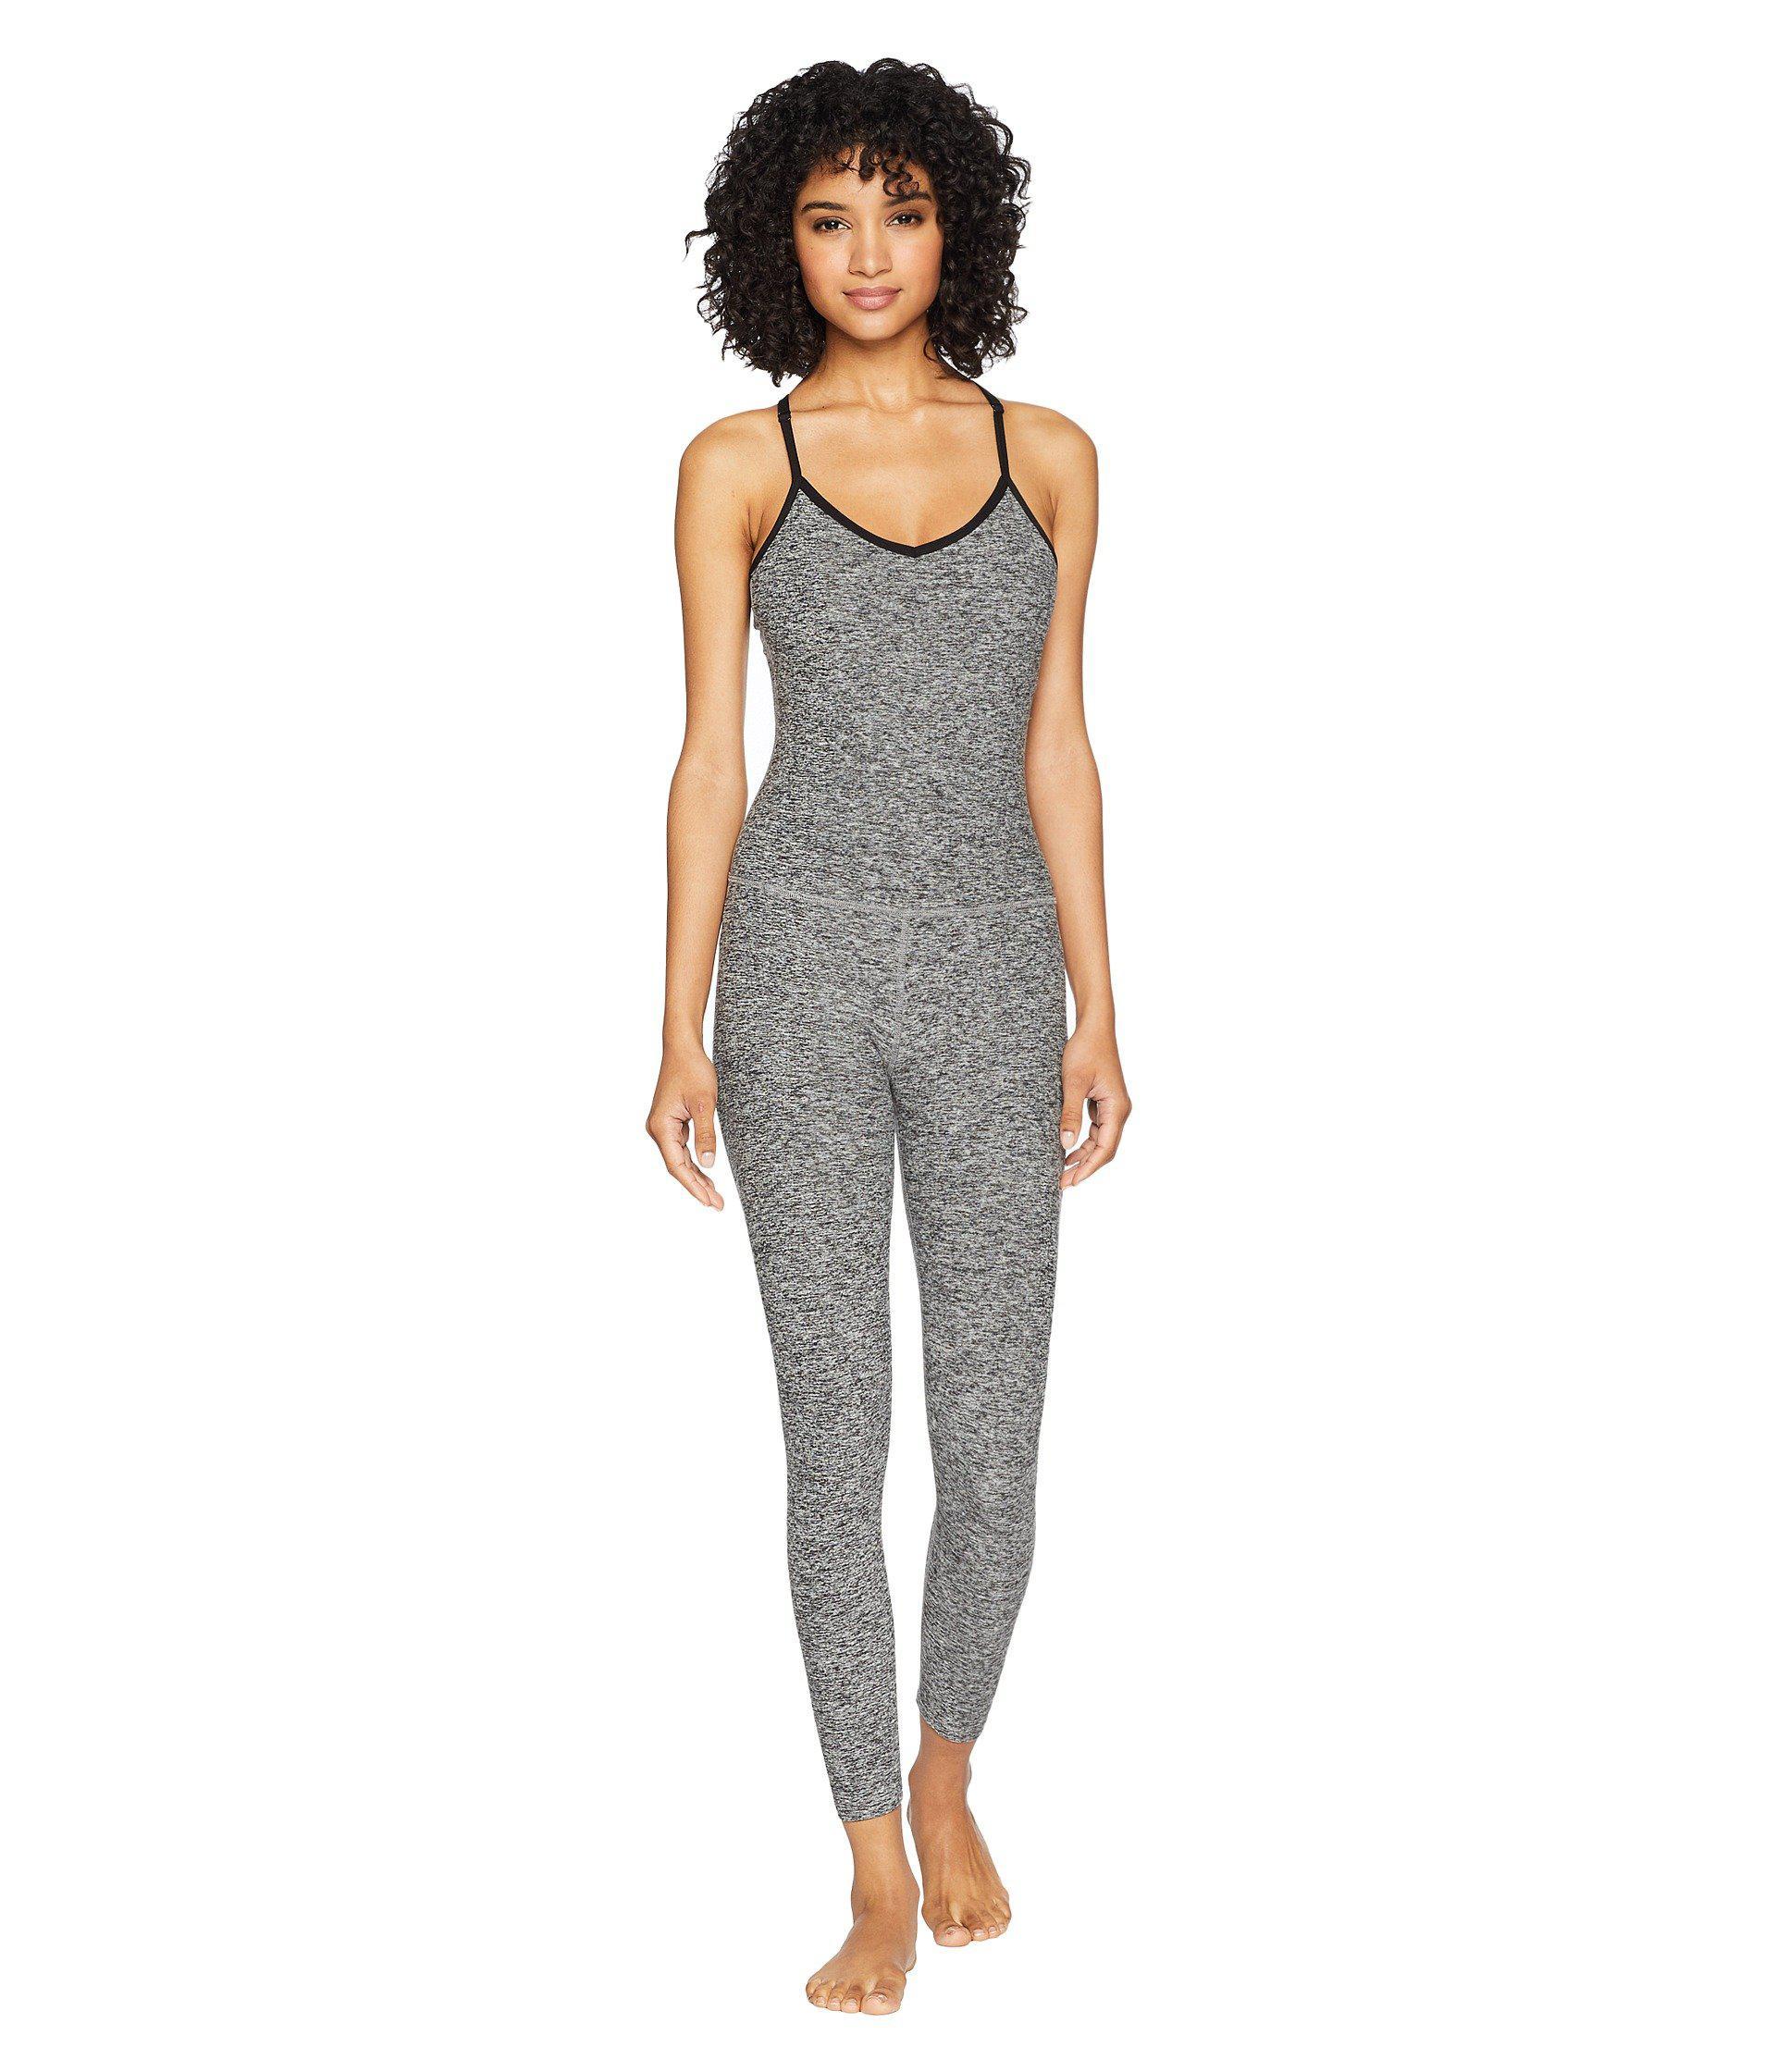 7a5936e3385 Beyond Yoga. Spacedye Elevation Capris Bodysuit (black white) Women s  Jumpsuit   Rompers One Piece